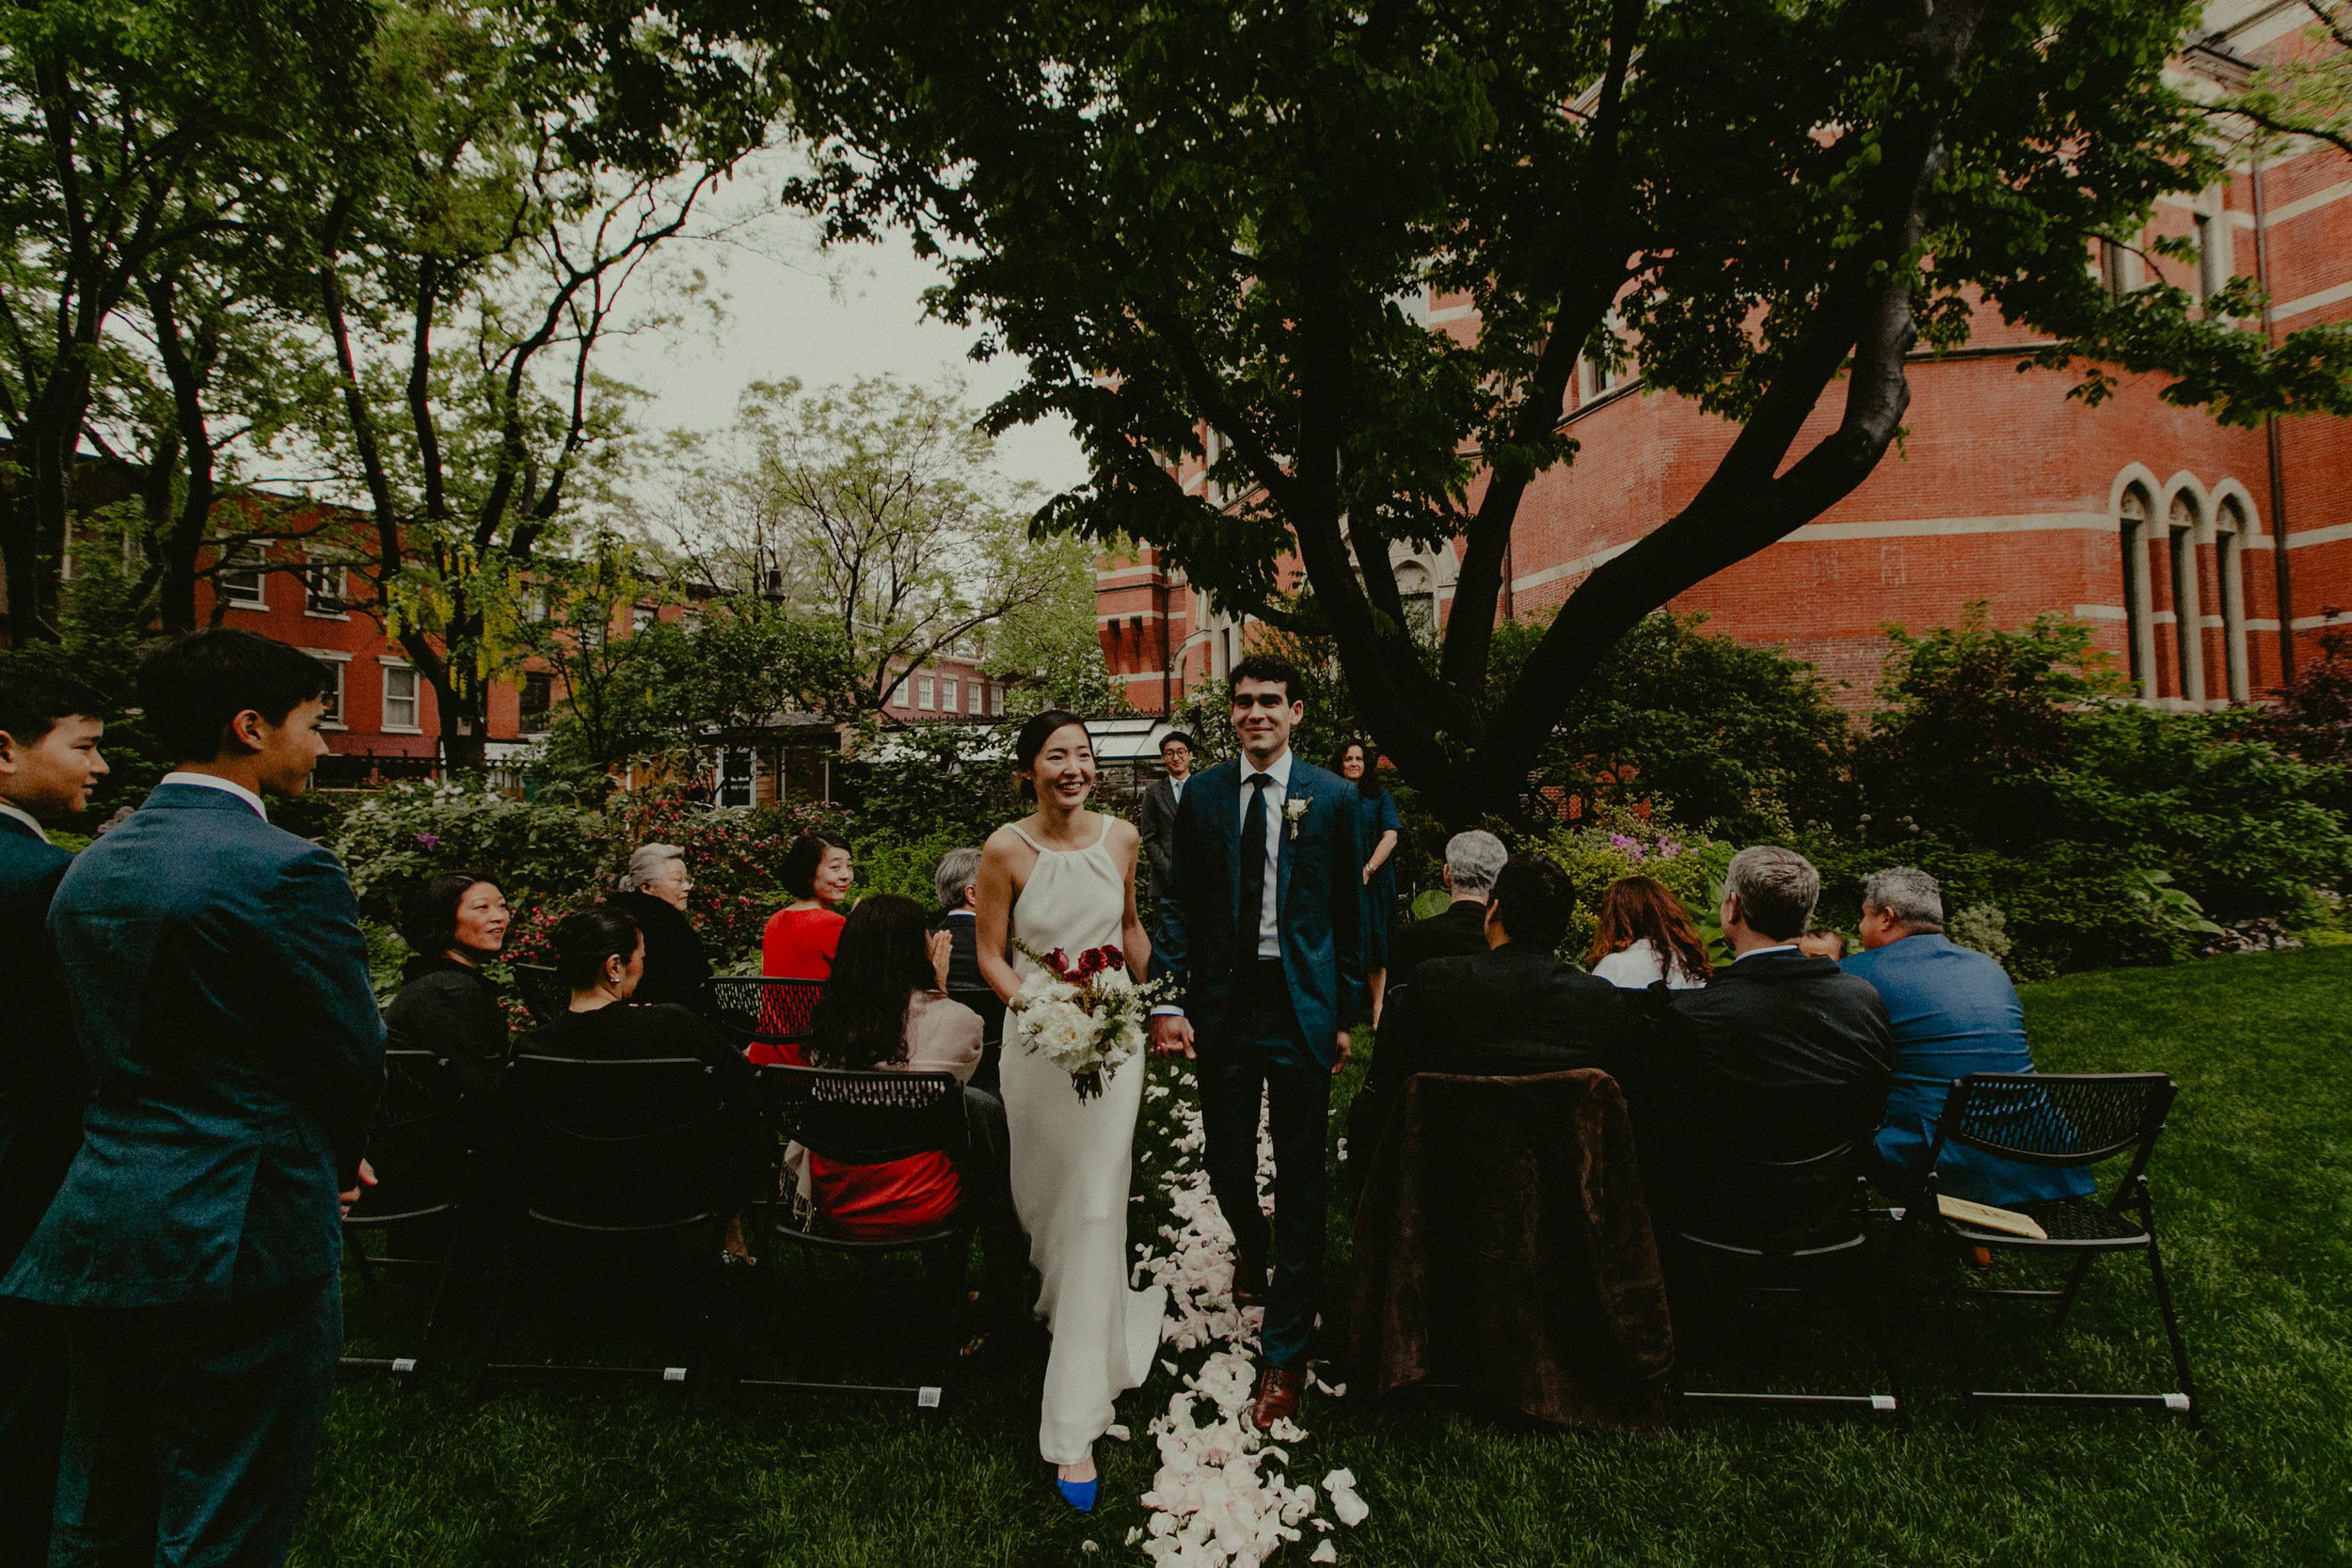 beekman hotel 469jefferson garden market wedding.JPG